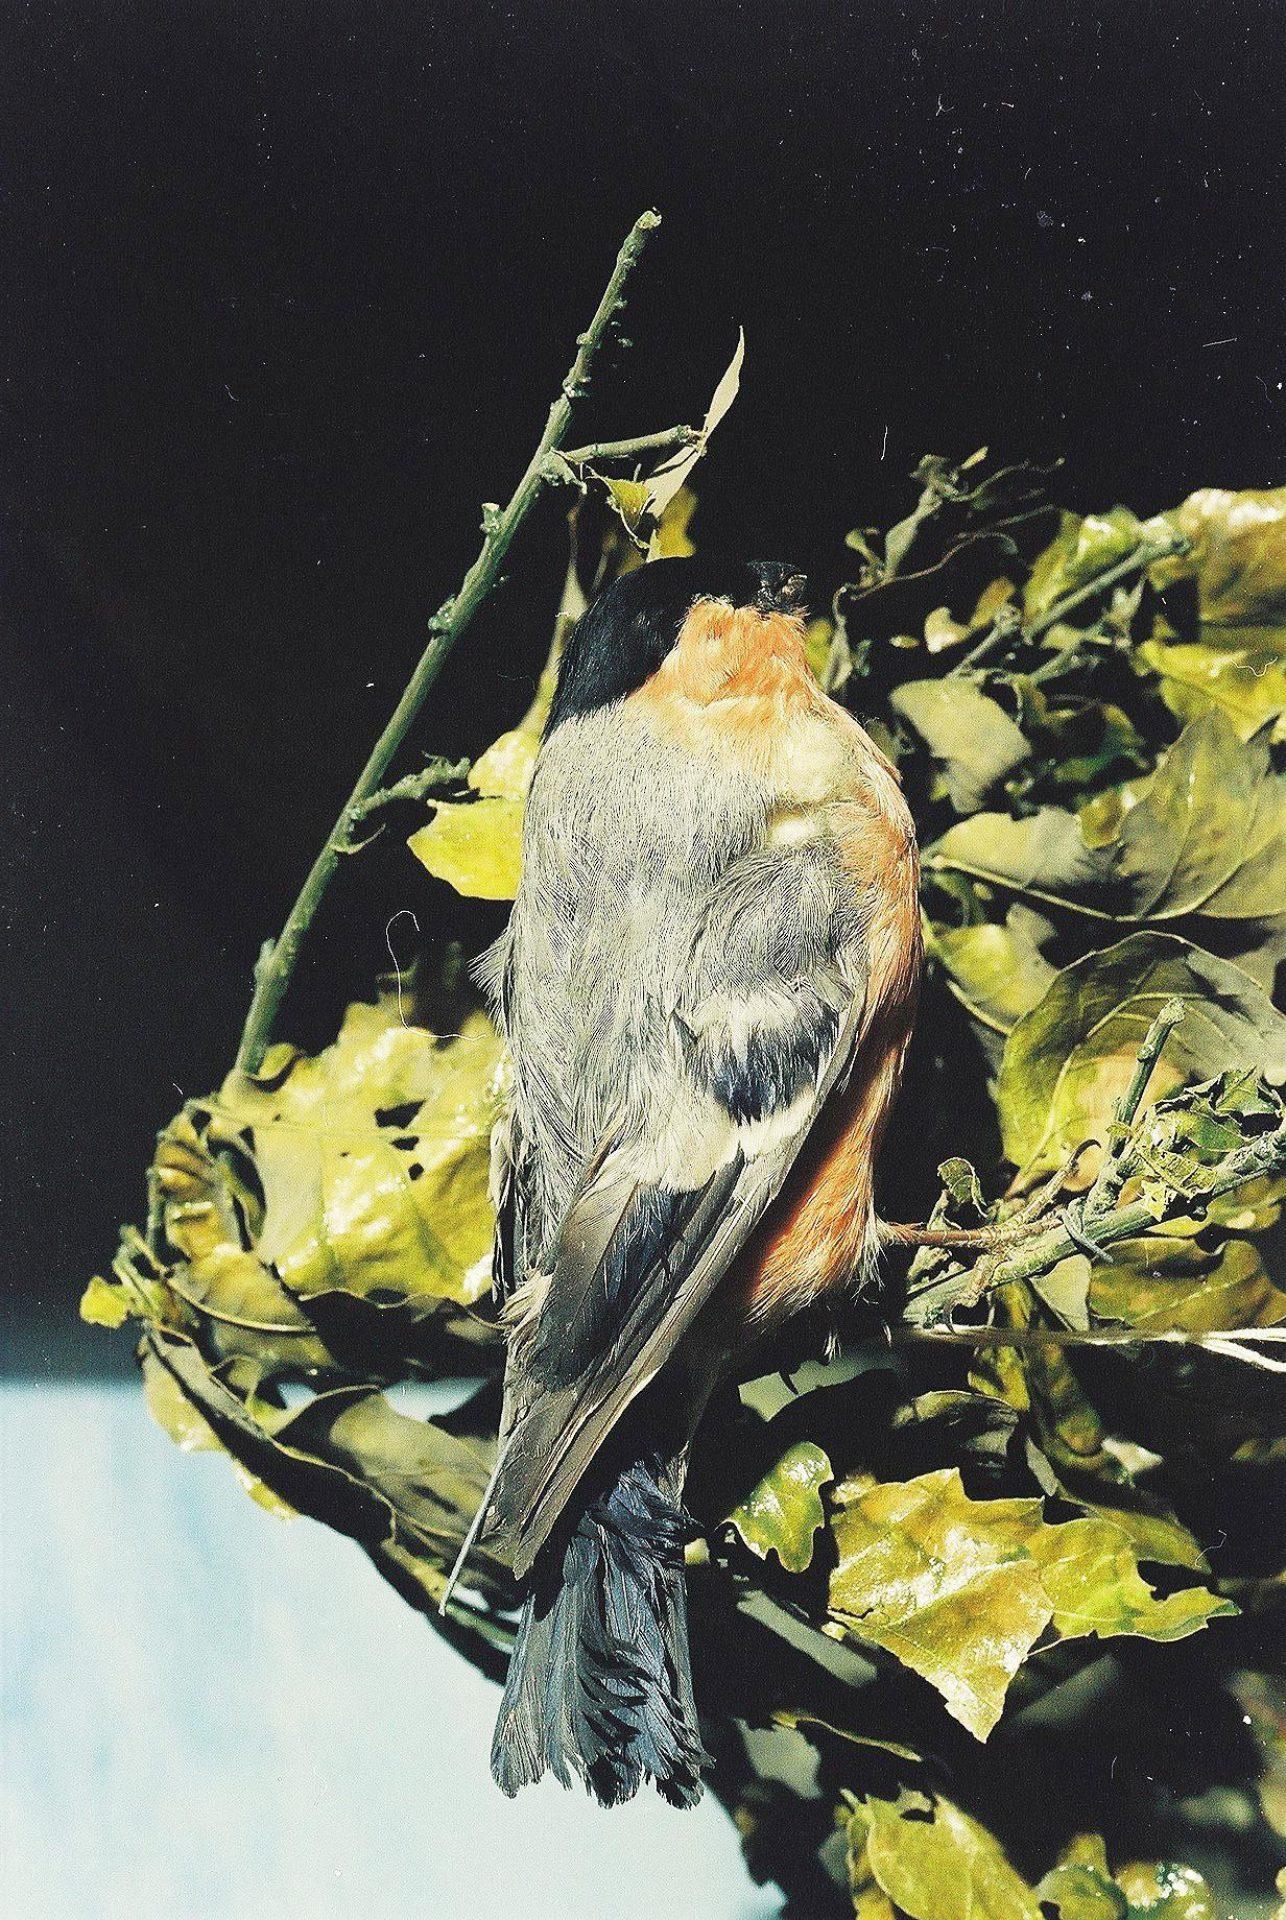 Petrit Halilaj, Special Edition (ex-Natural History Museum of Kosovo), 2013 (02/80)